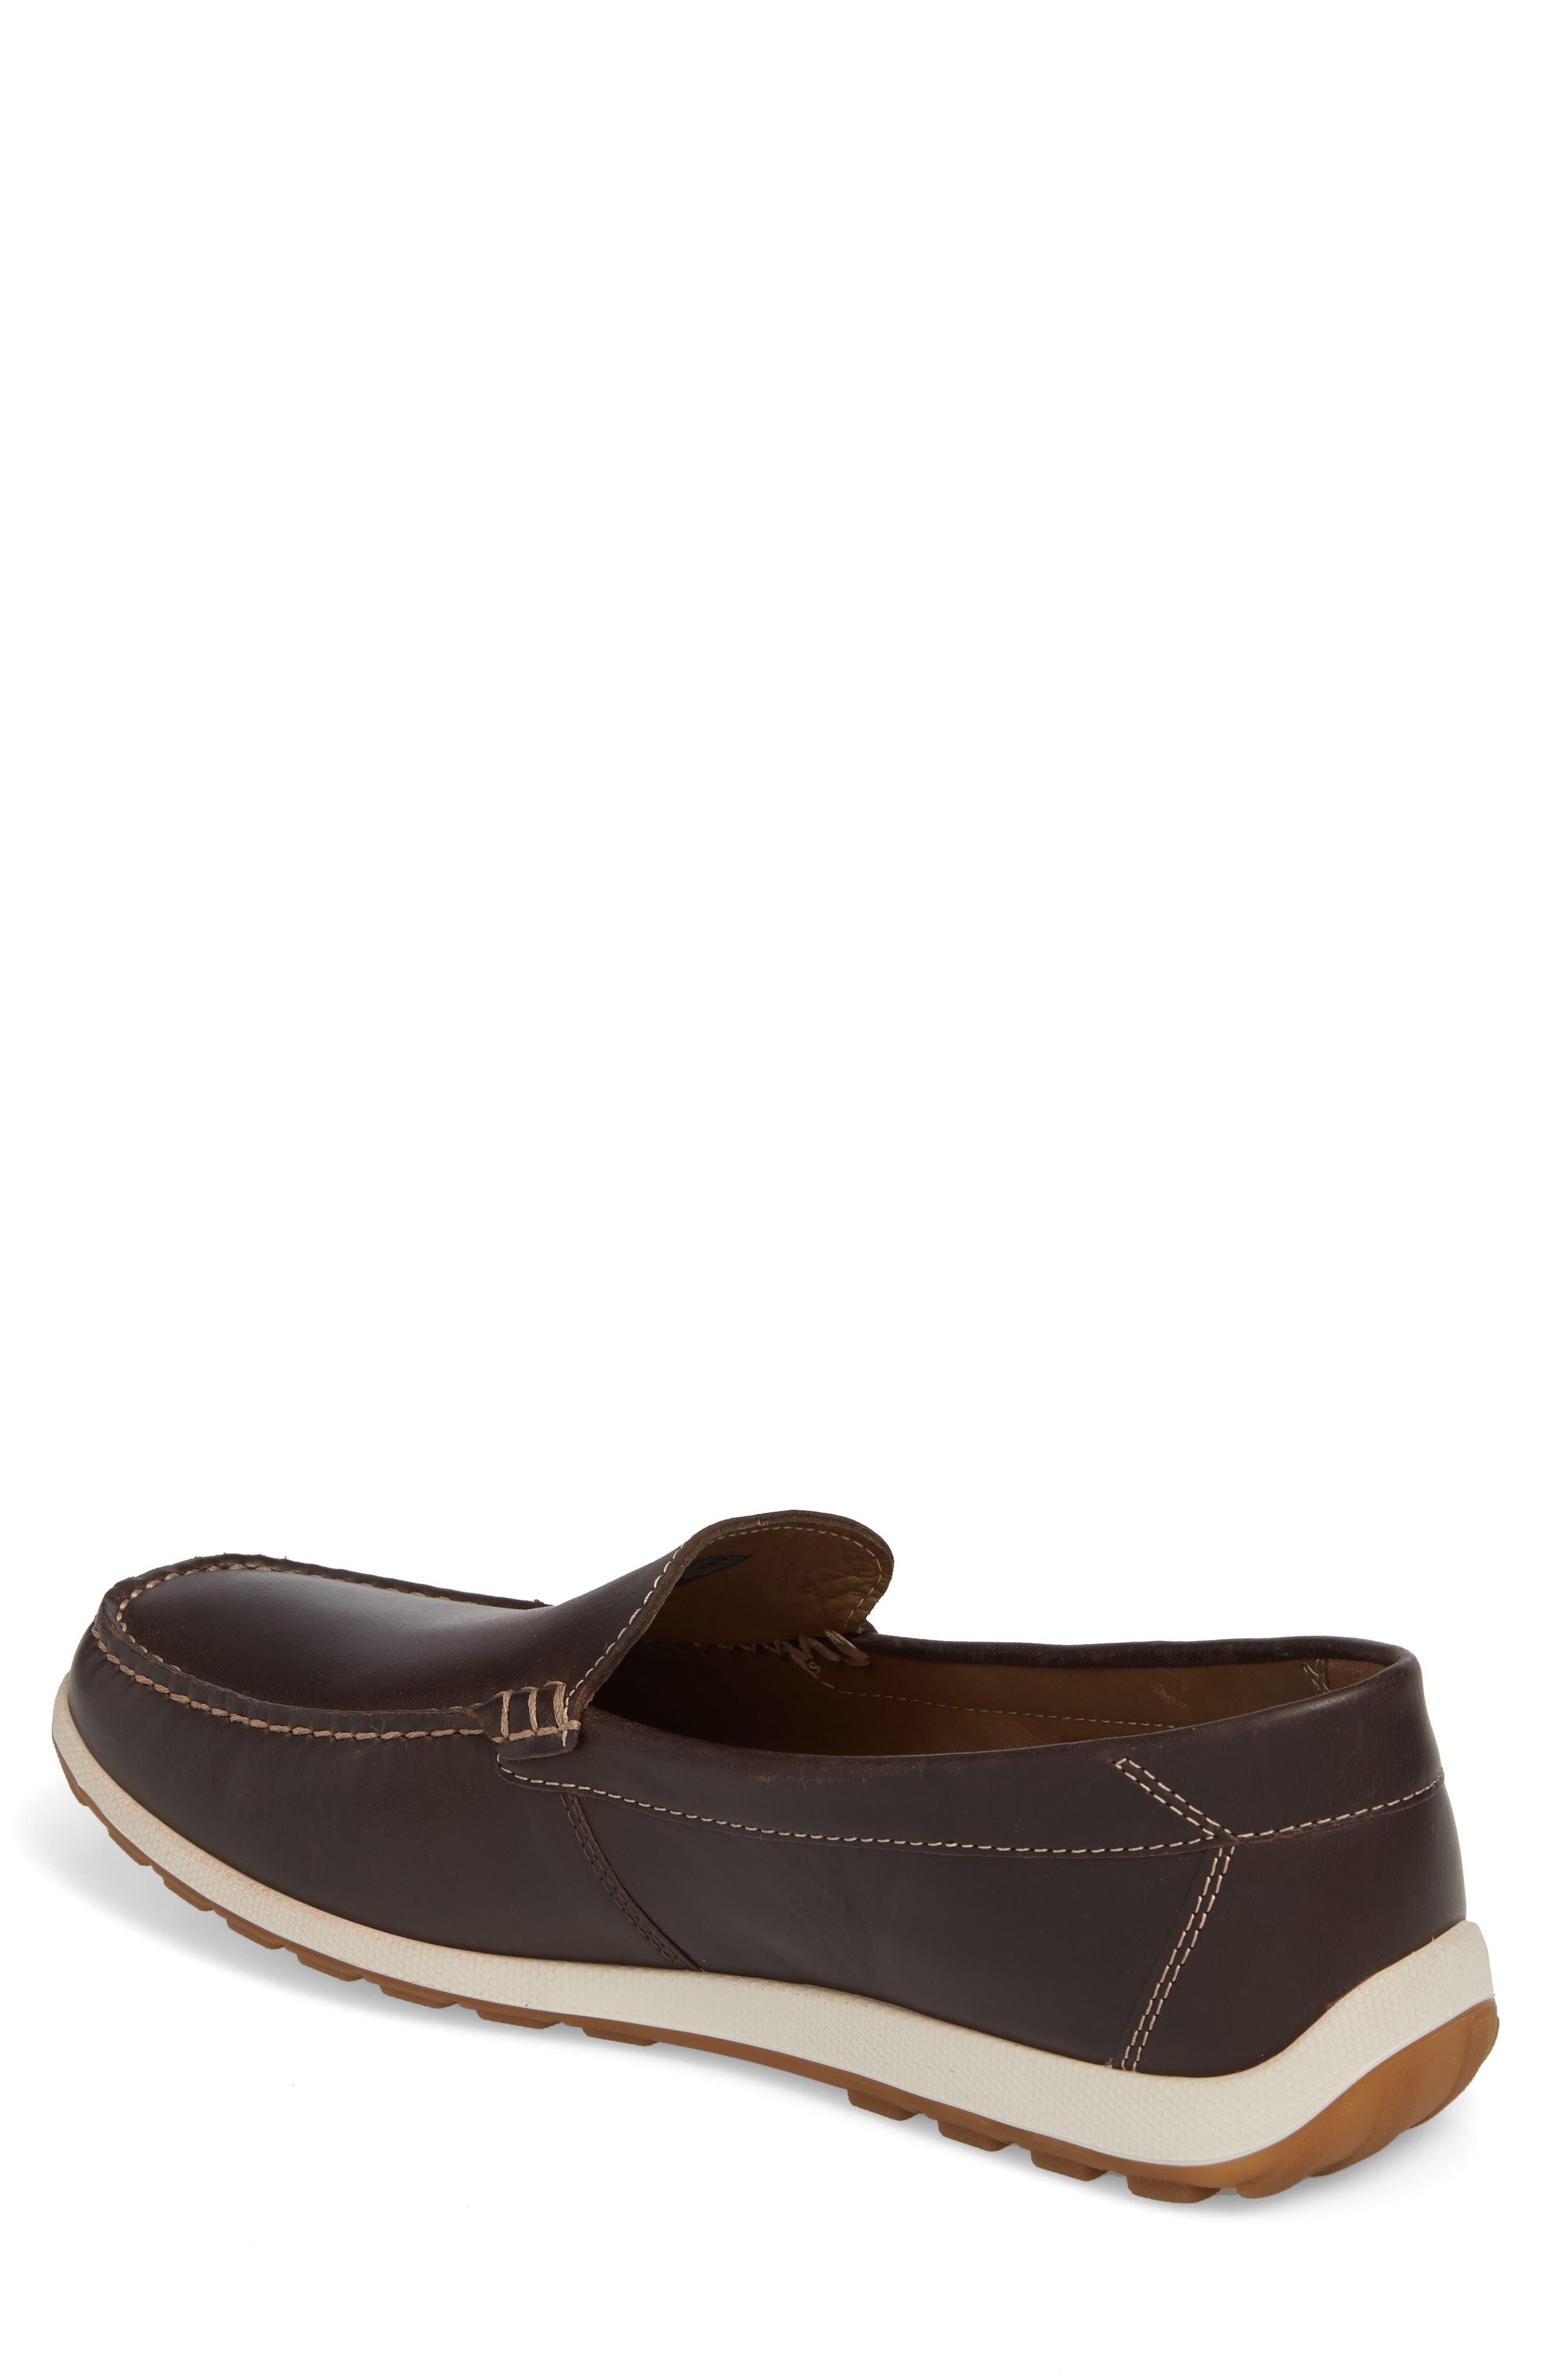 Dip Moc Toe Driving Loafer,                             Alternate thumbnail 2, color,                             Mocha Leather